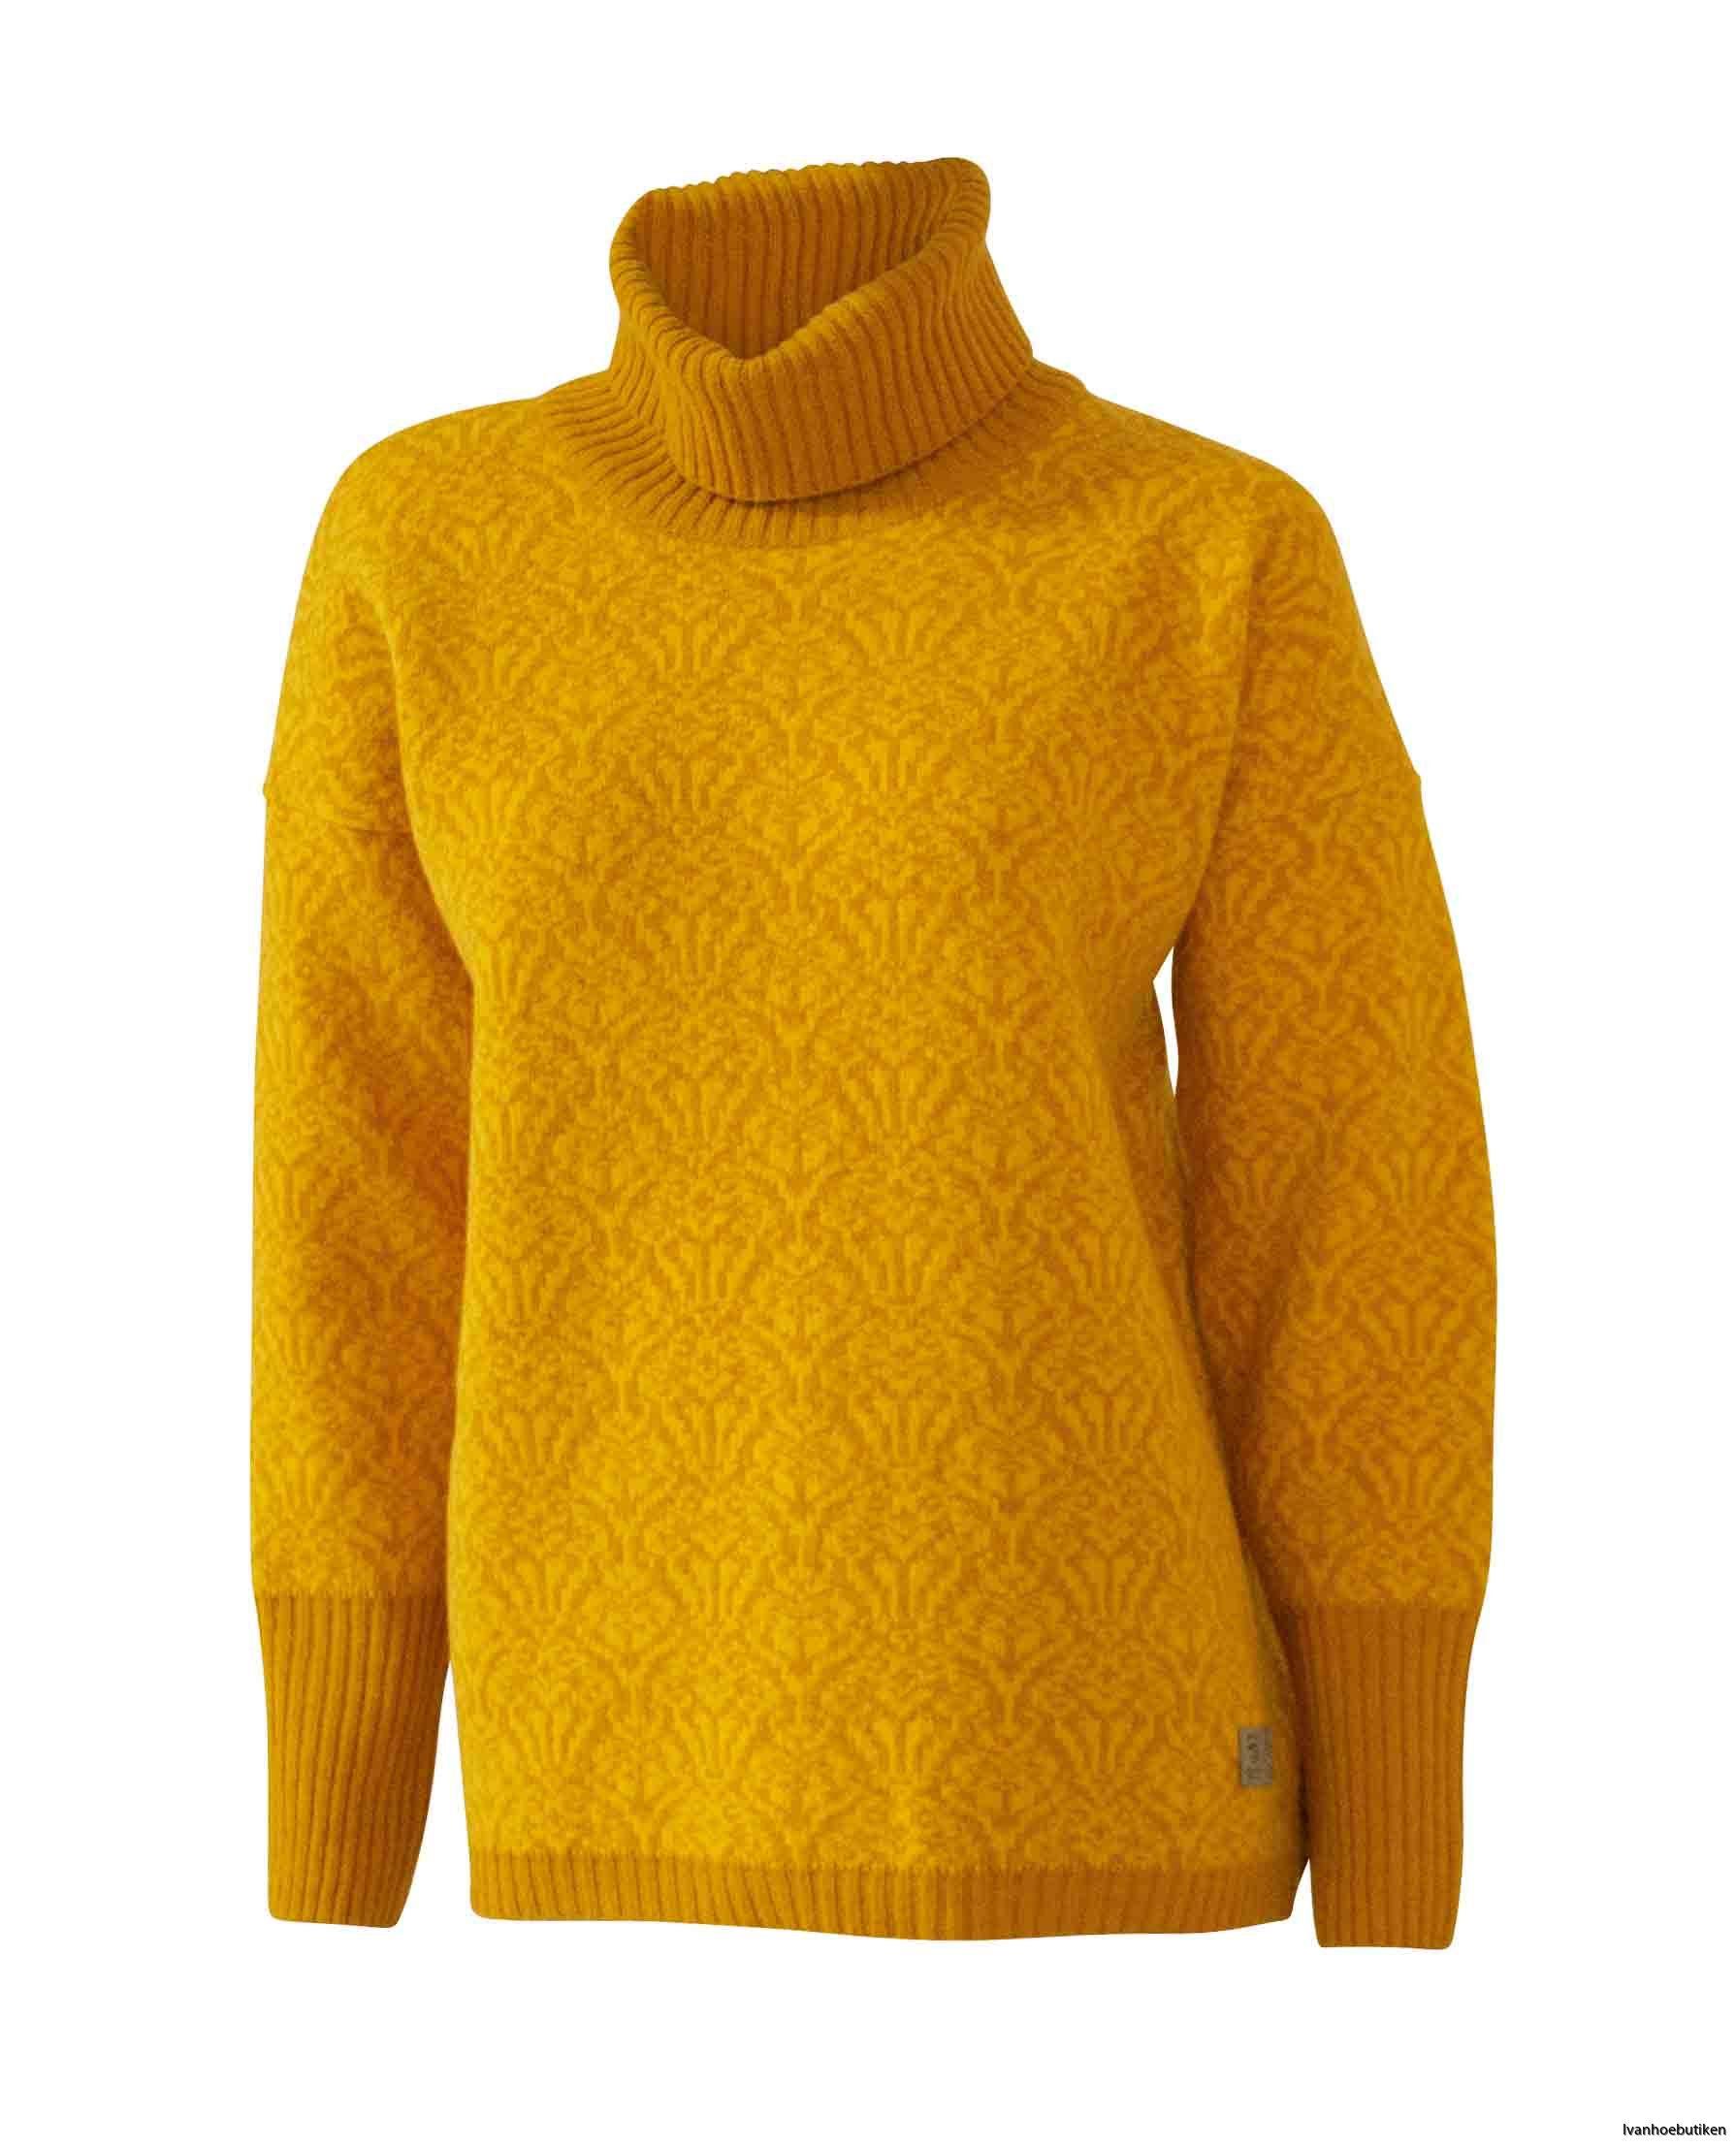 GY_Korrebo_Sweater_072